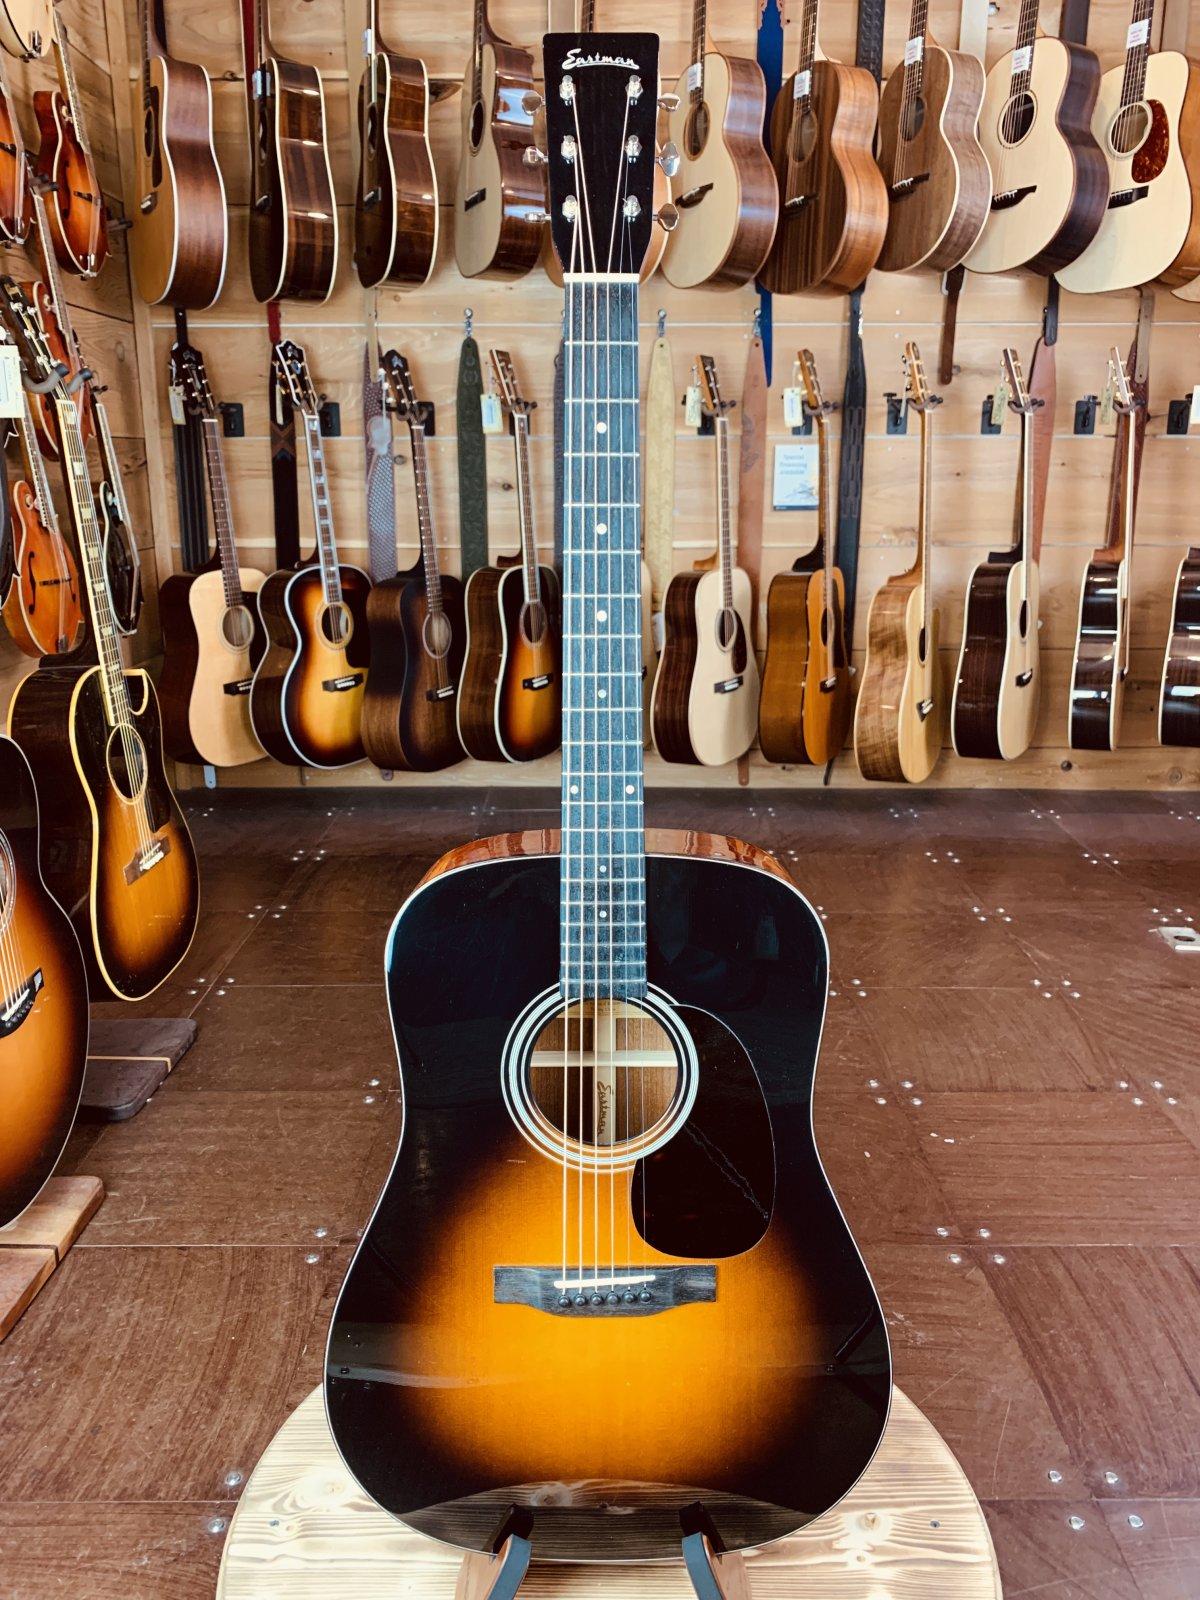 (Used) Eastman E6D-SB #5786 Sunburst Dreadnought Acoustic